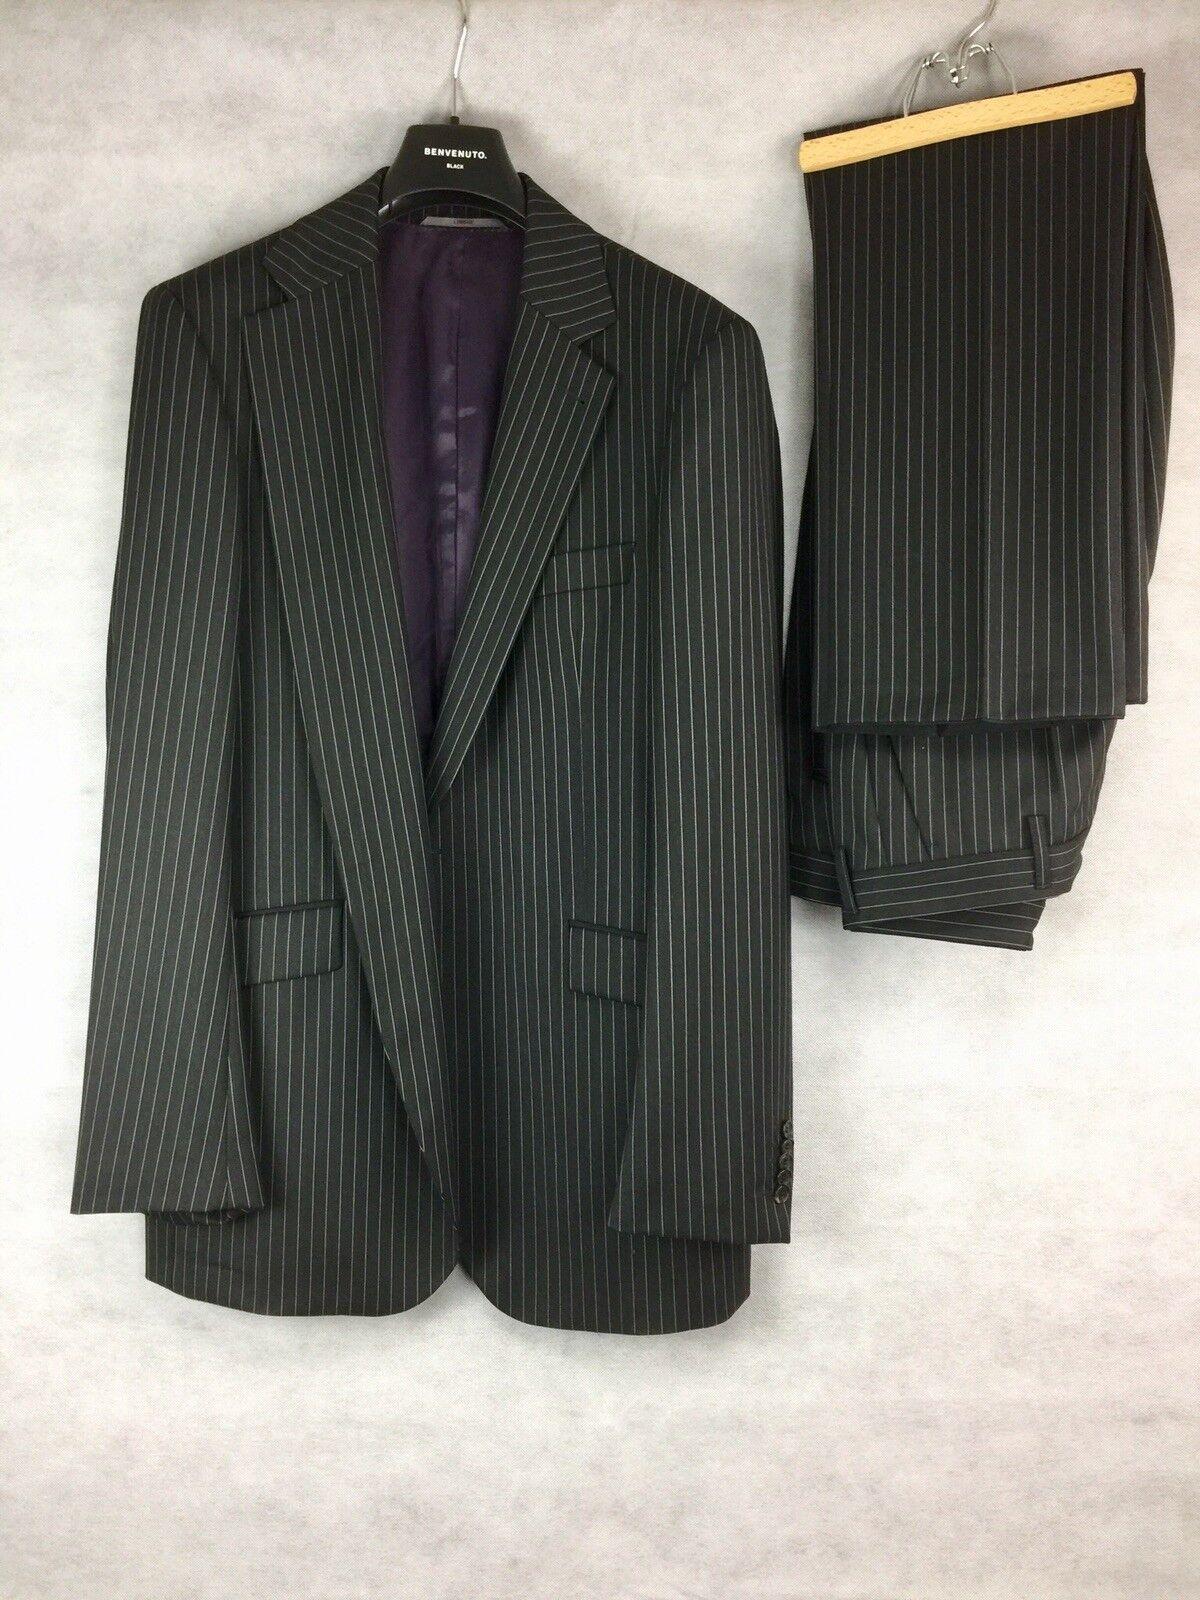 Edler Marken CINQUE Anzug MAYFIELD (2-Teilig) Blazer = Gr. 54 & Hose = Gr. 50